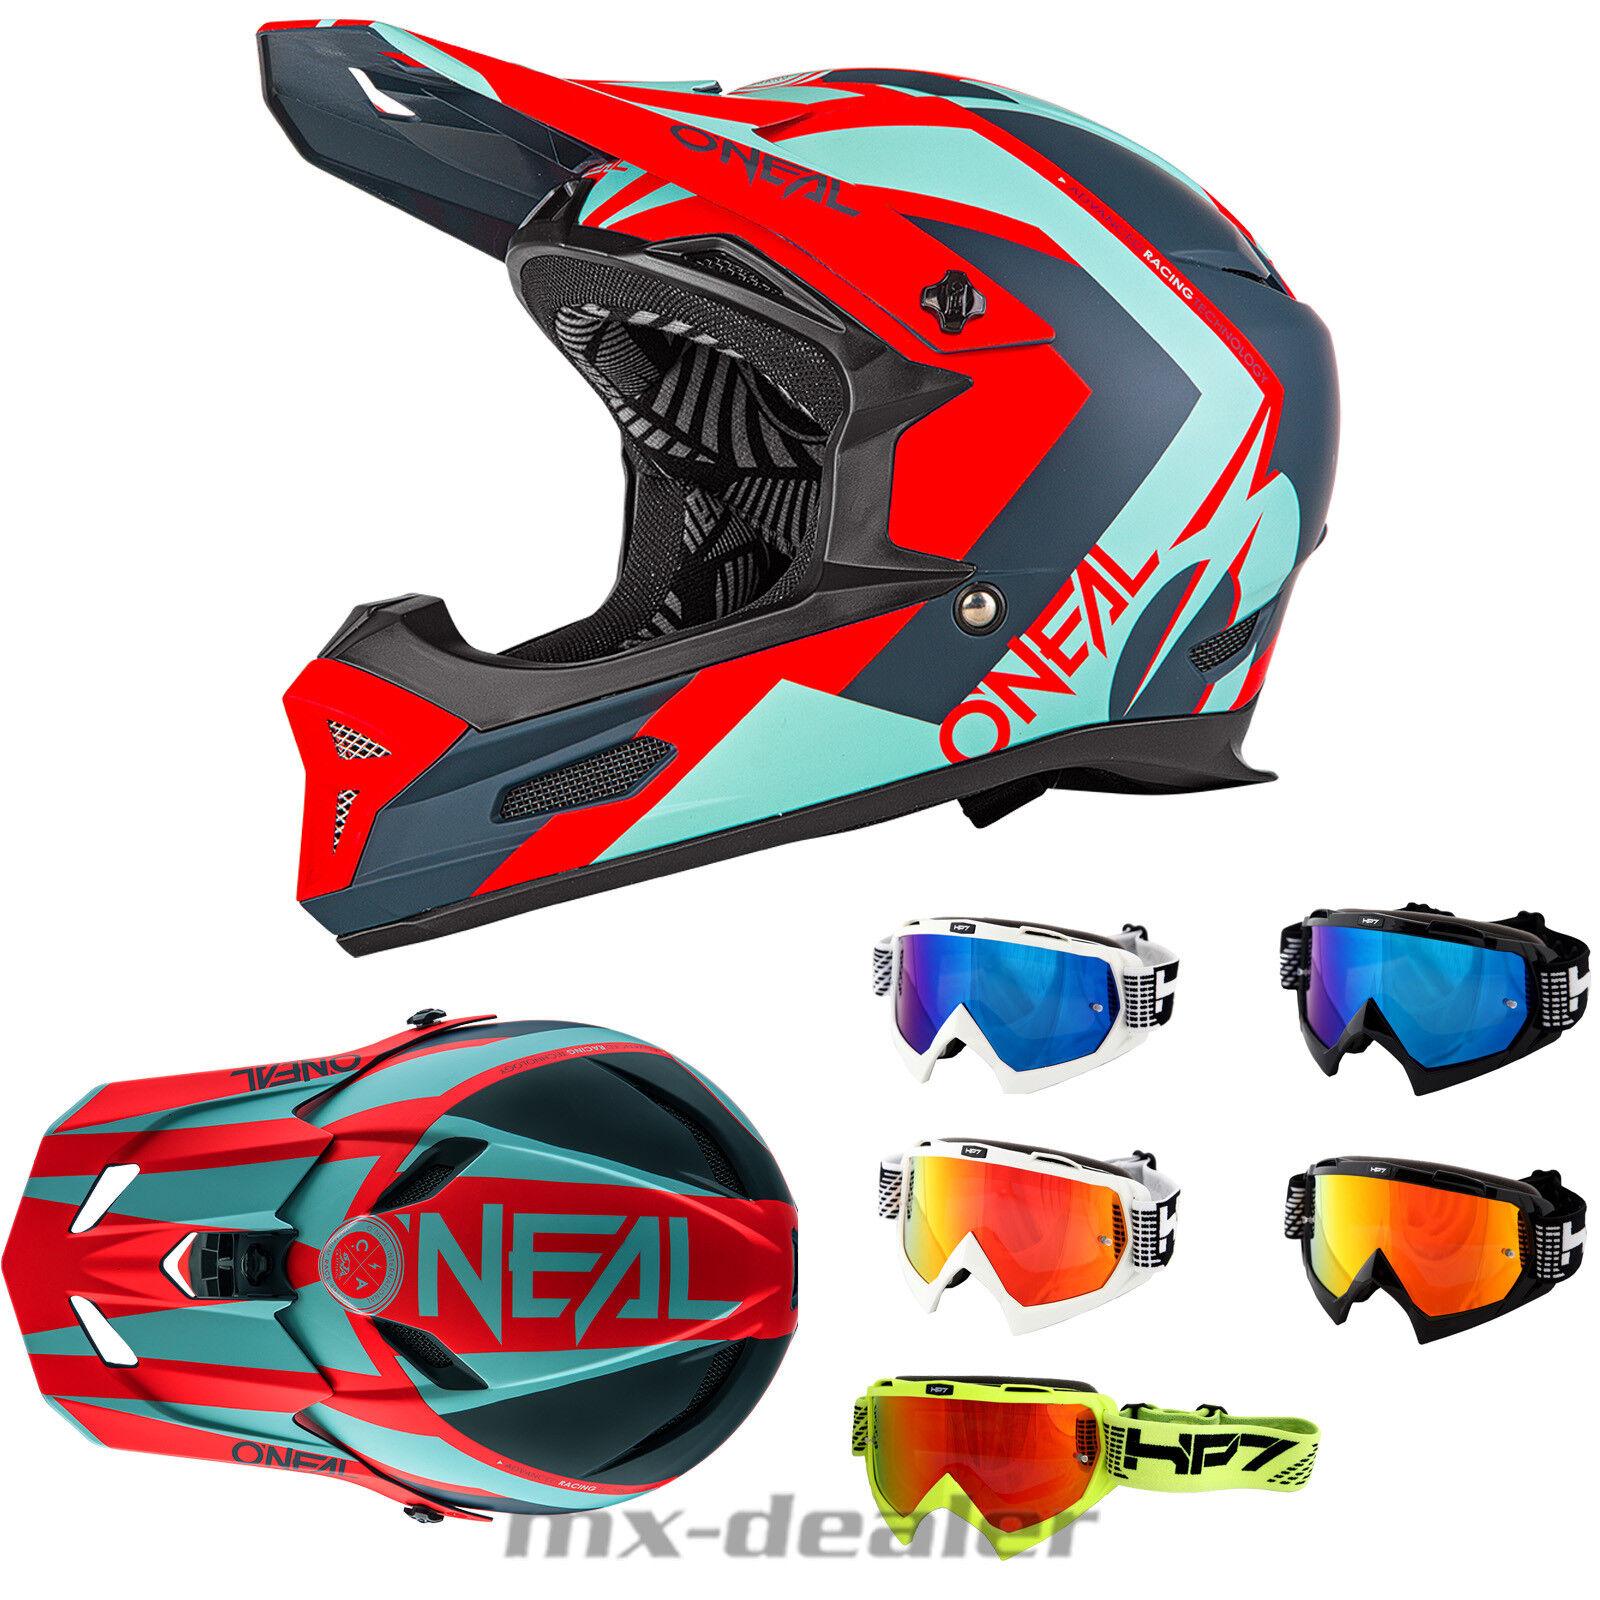 O'Neal 19 FURY RL Hybrid red MTB DH Helm + HP7 Brille Downhill Go Pro Halter BMX